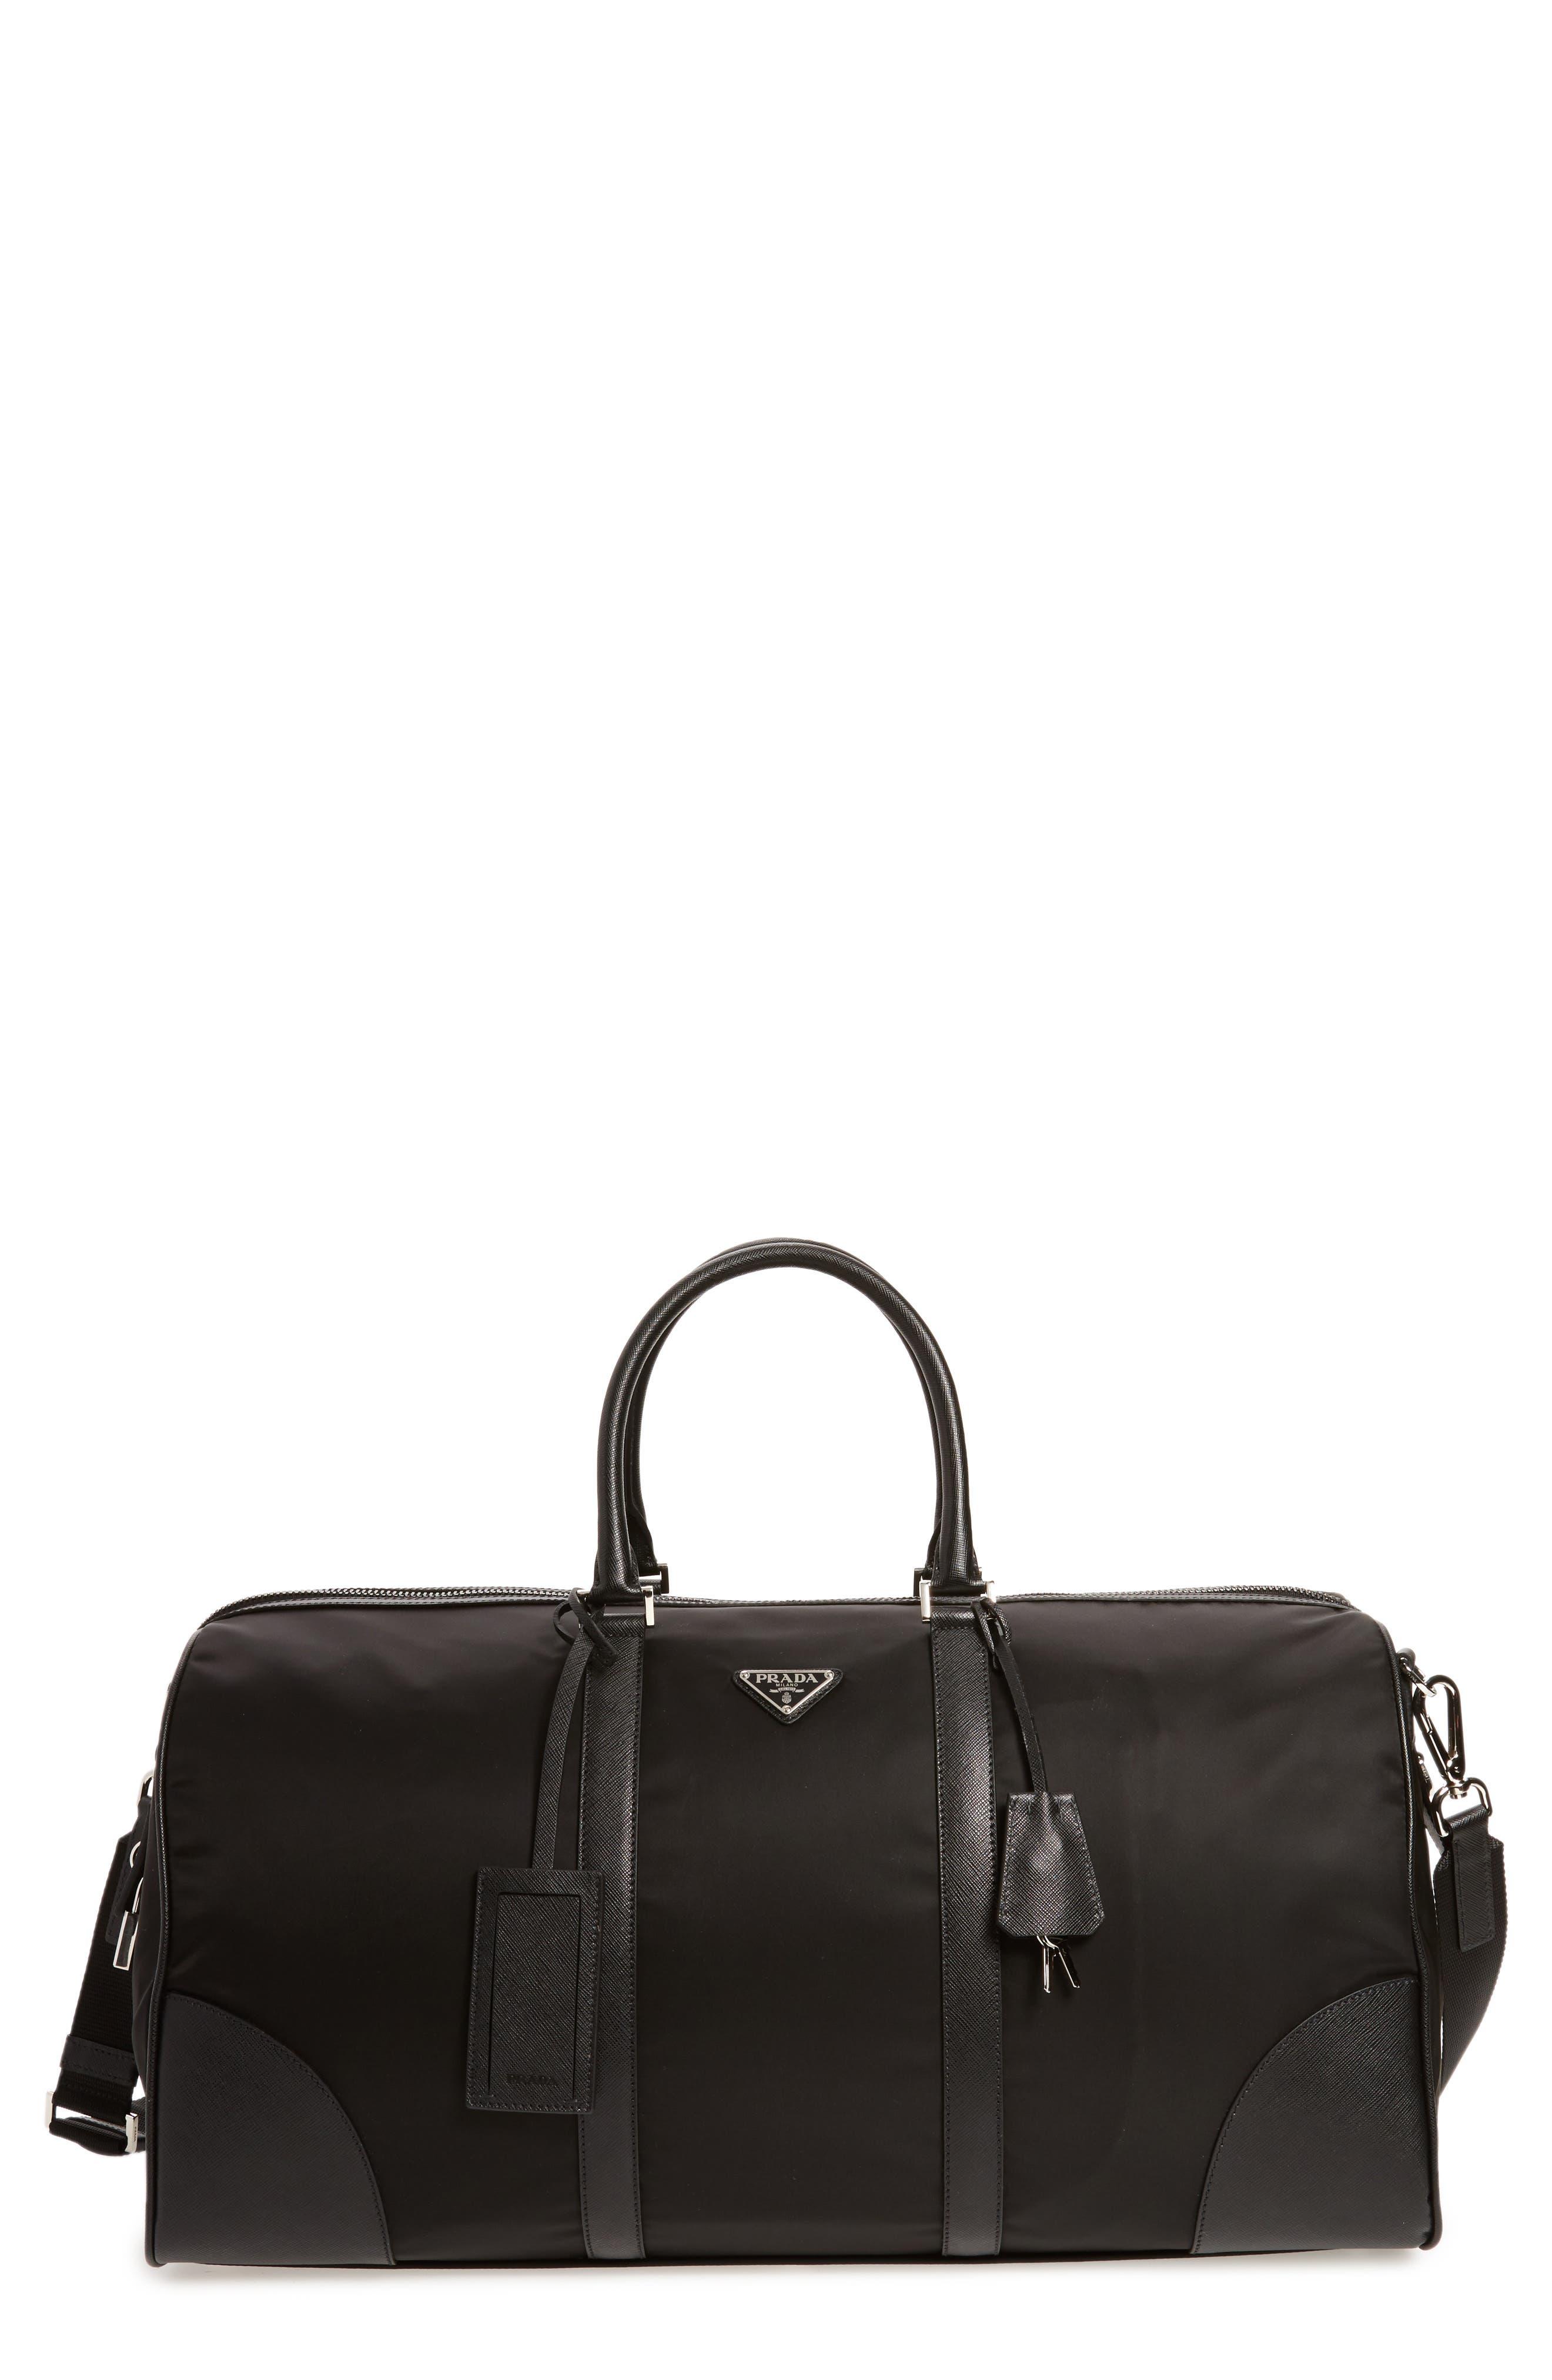 ... low price prada mens womens diaper navy blue messenger bag c944e 53321  coupon code mens prada backpacks messenger bags duffels and briefcases  nordstrom ... d20ef0d73cfc0